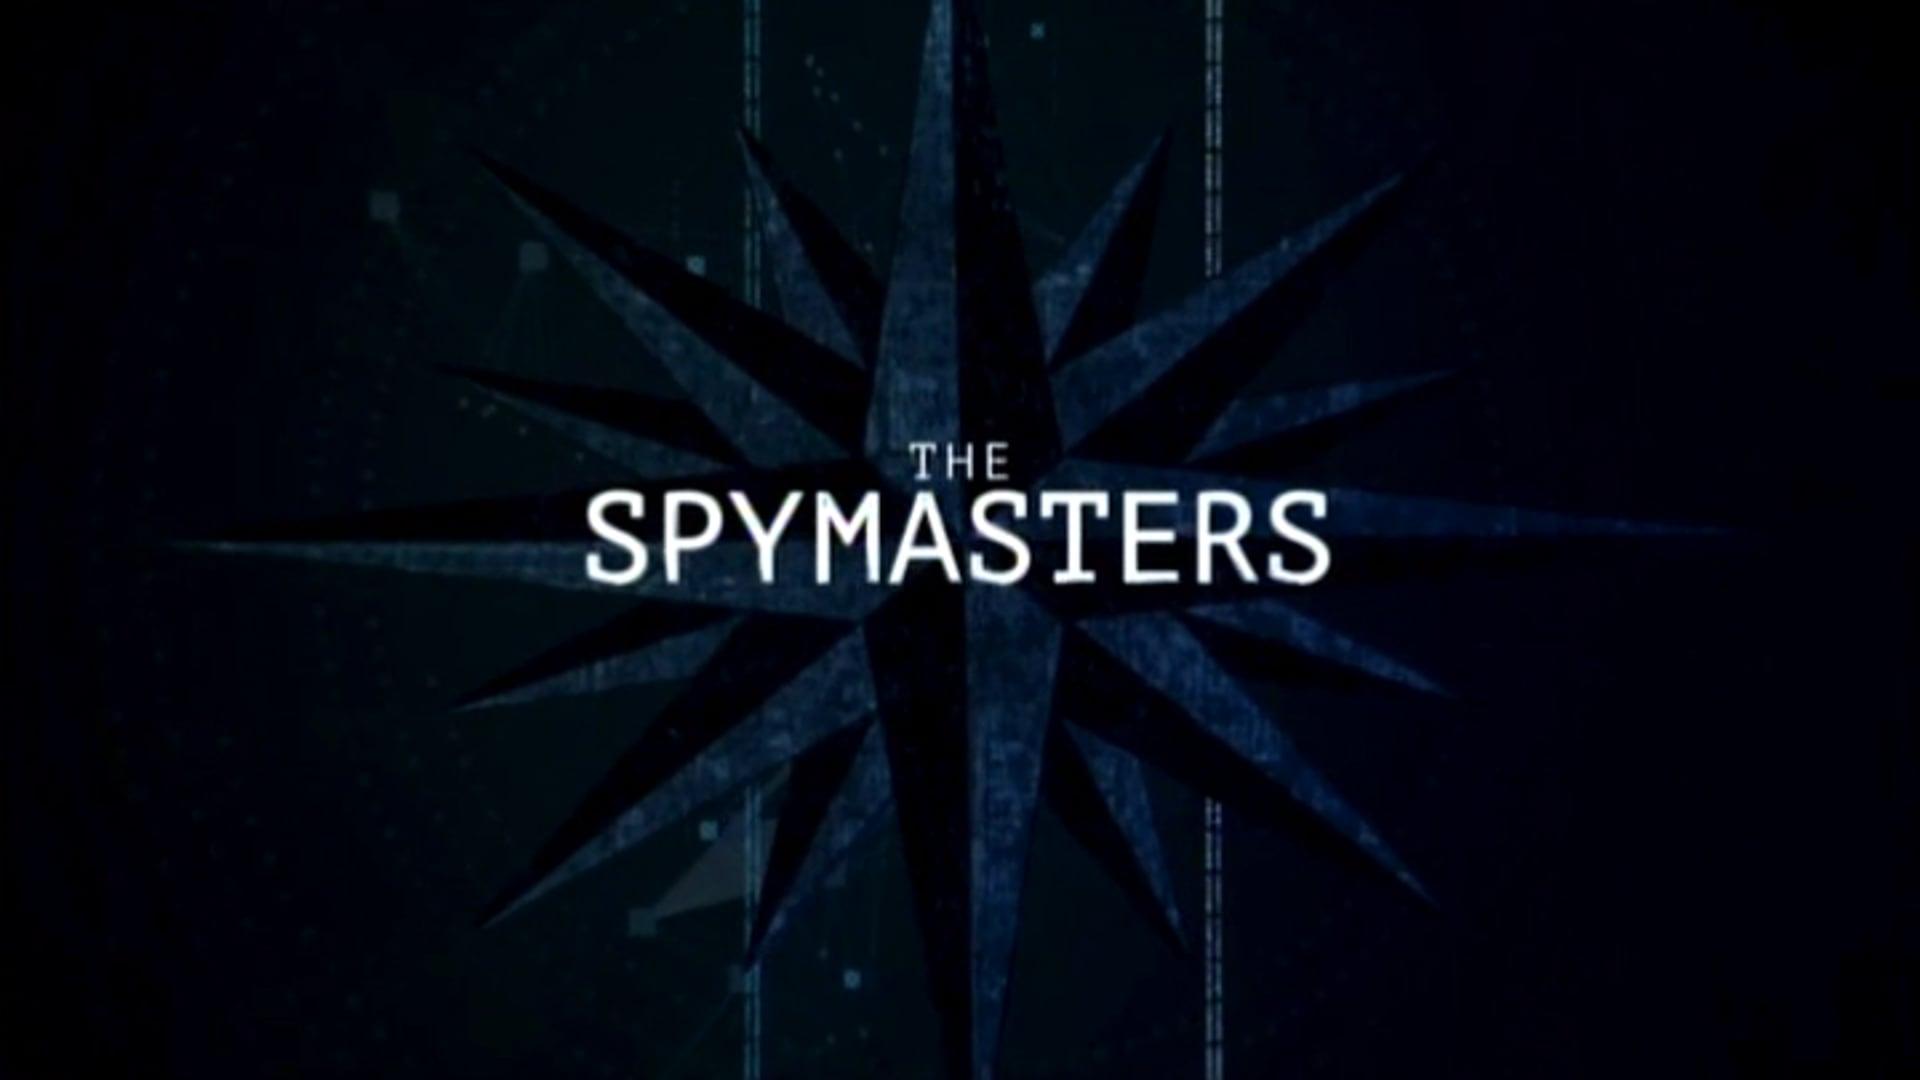 Spymasters Theme